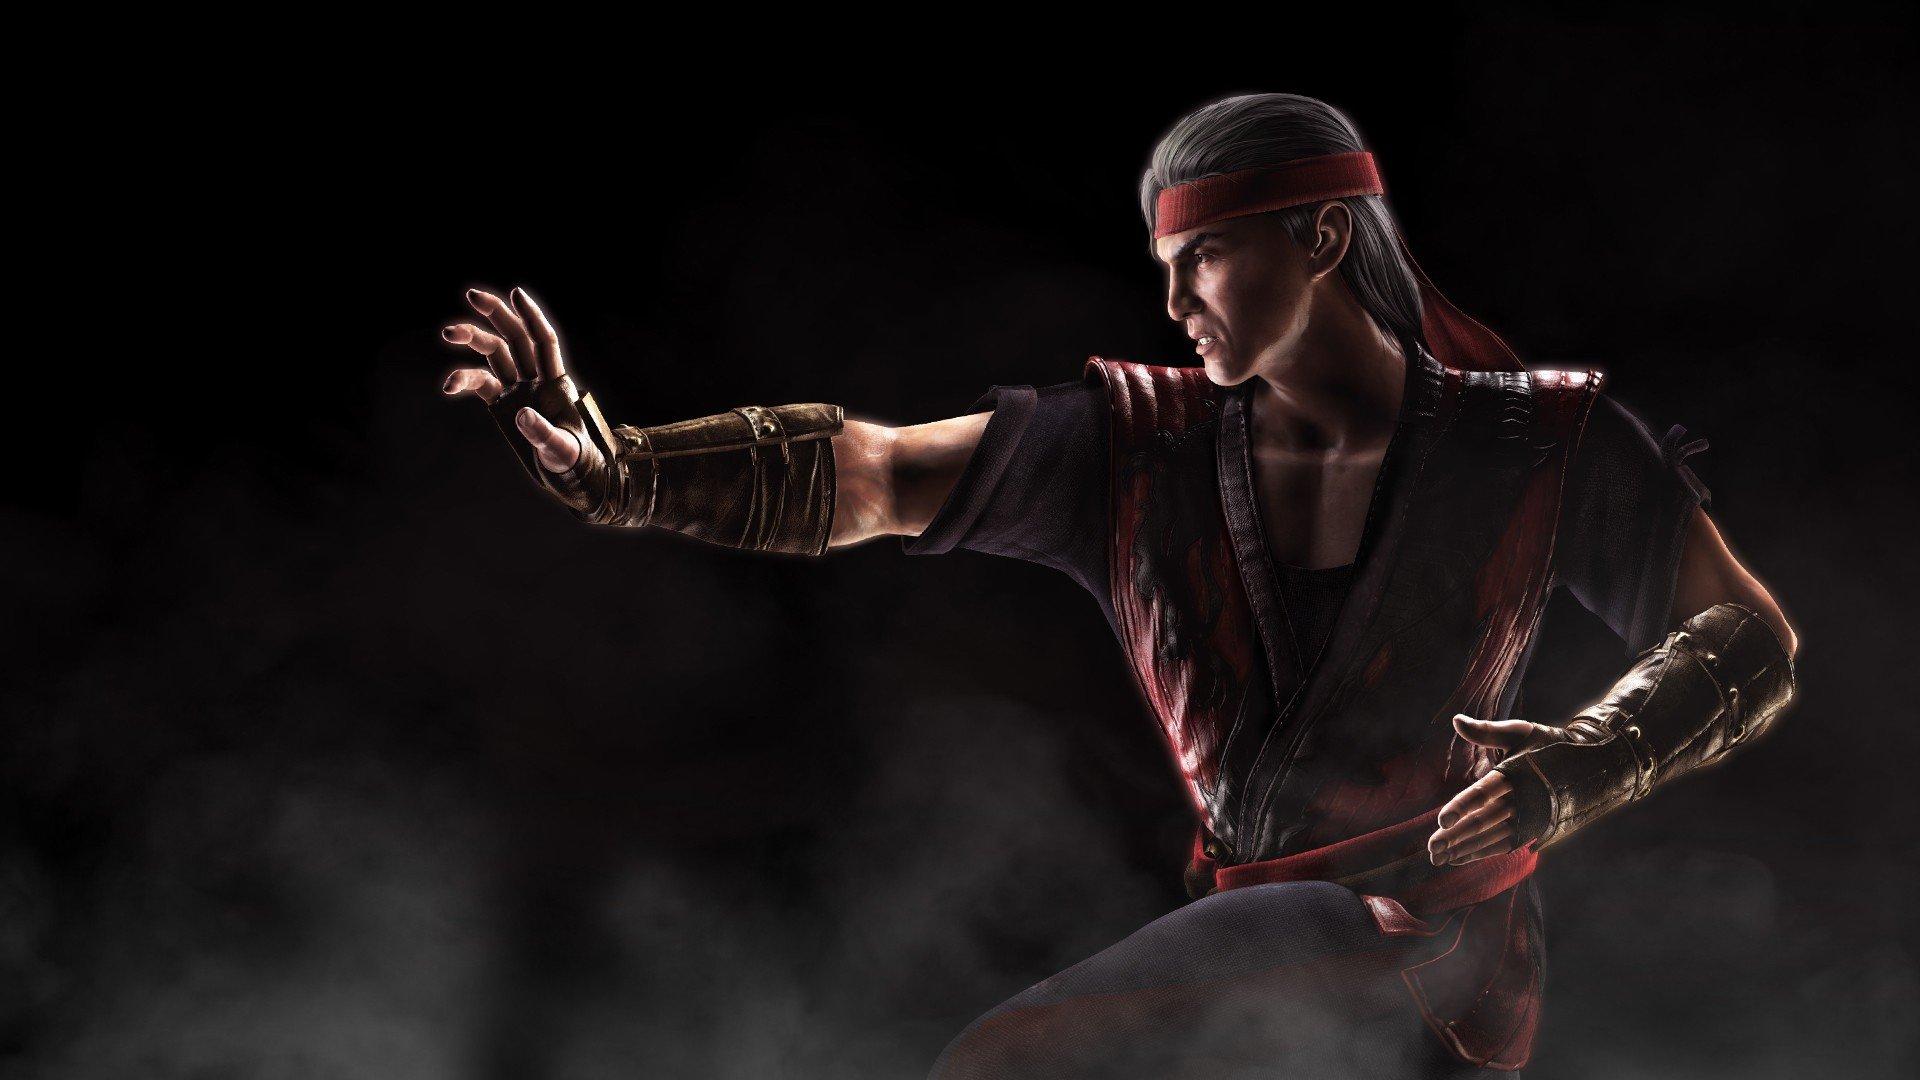 1920x1080 Px Liu Kang Mortal Kombat X